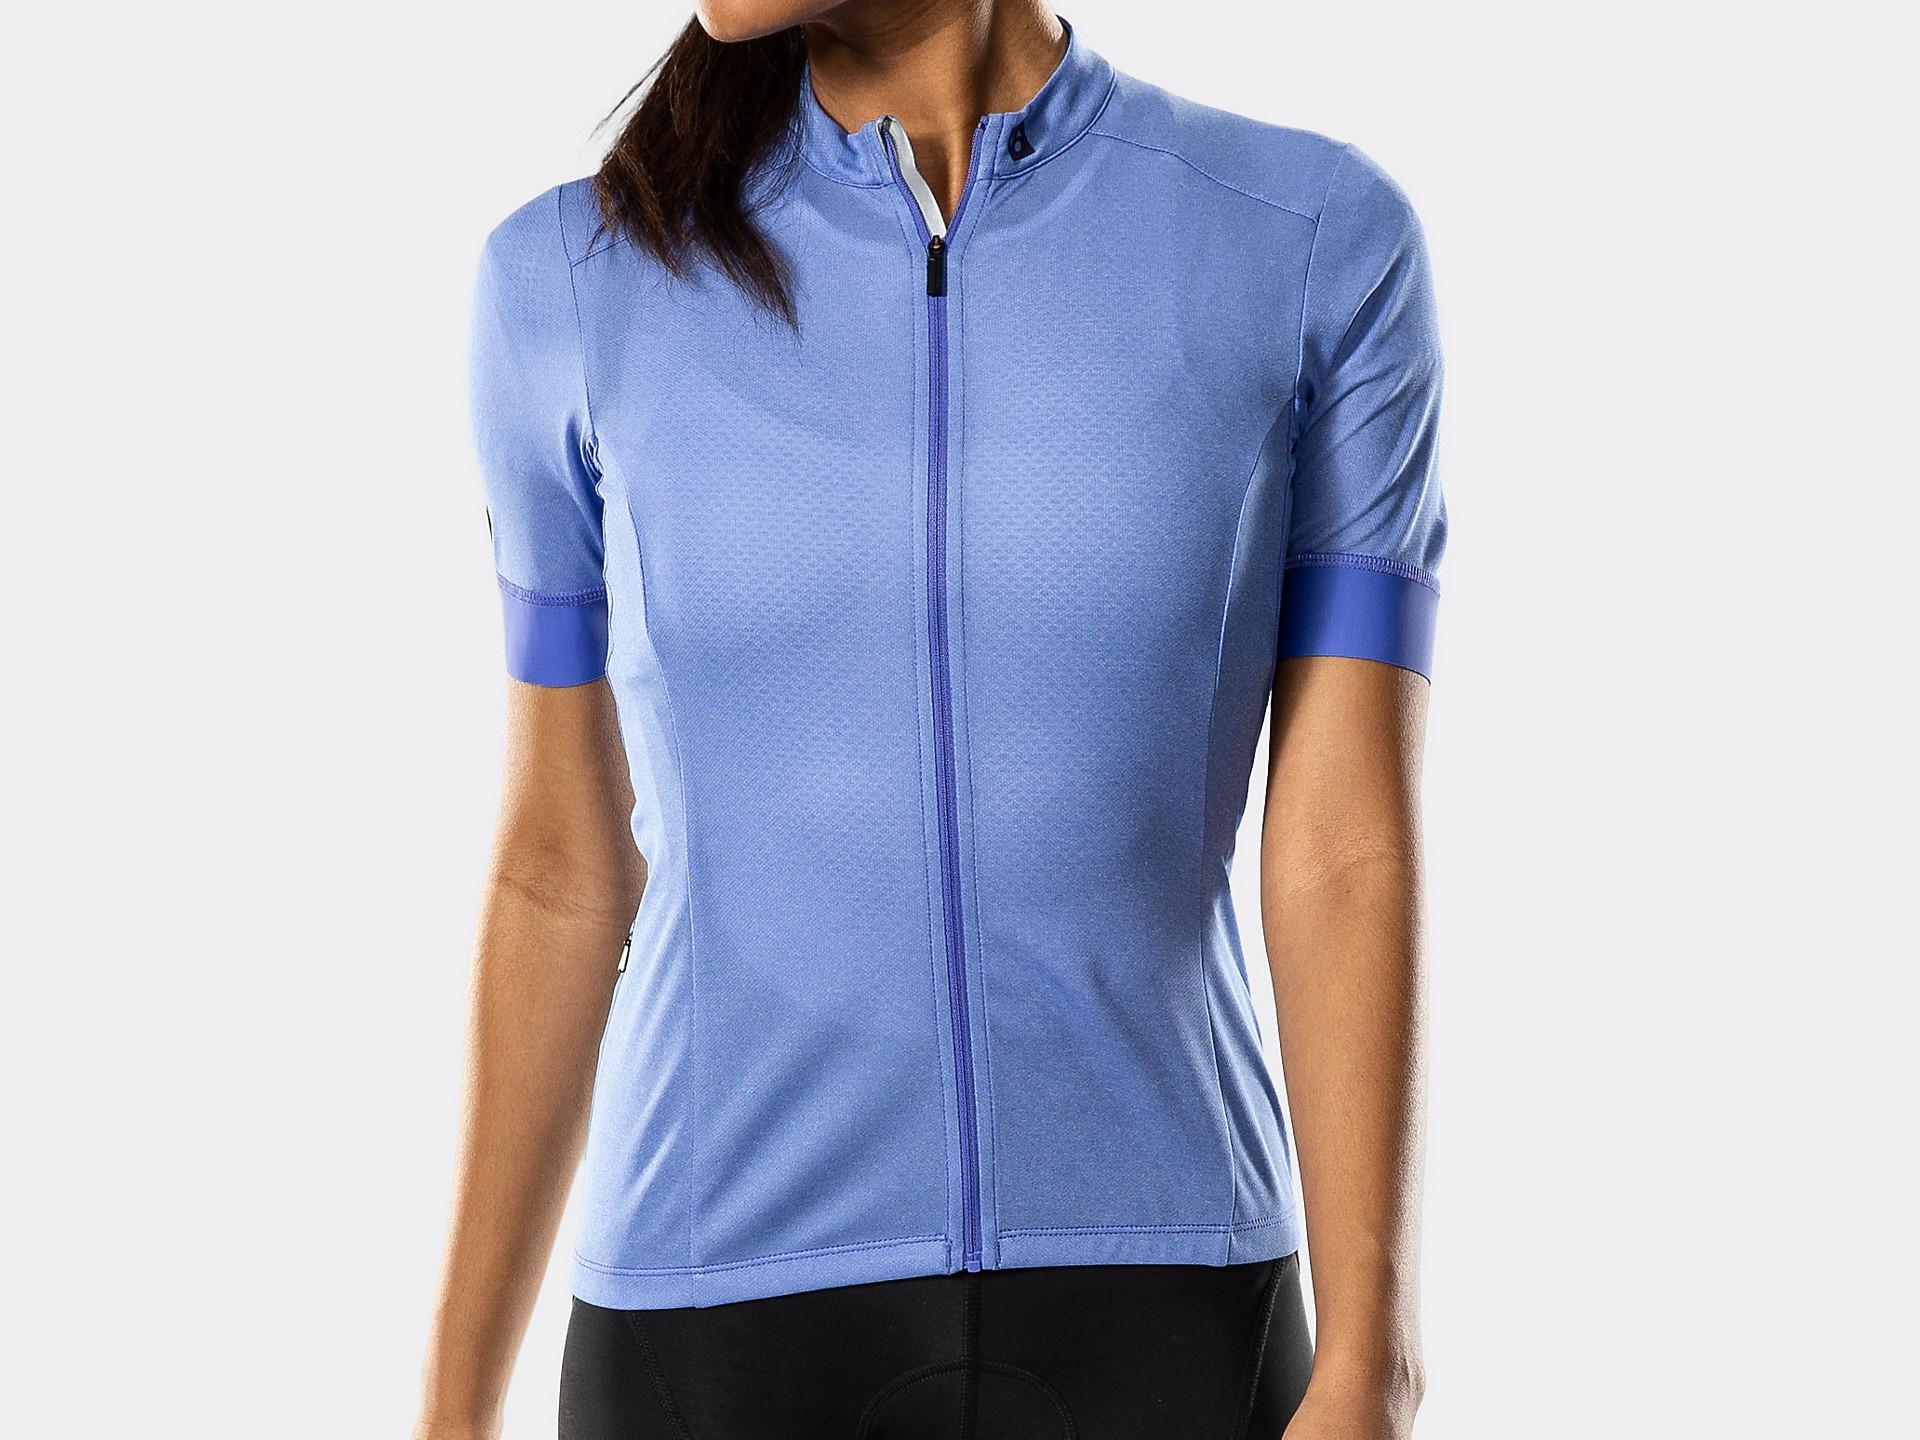 5b114f39fb Camiseta feminina de ciclismo Meraj Bontrager